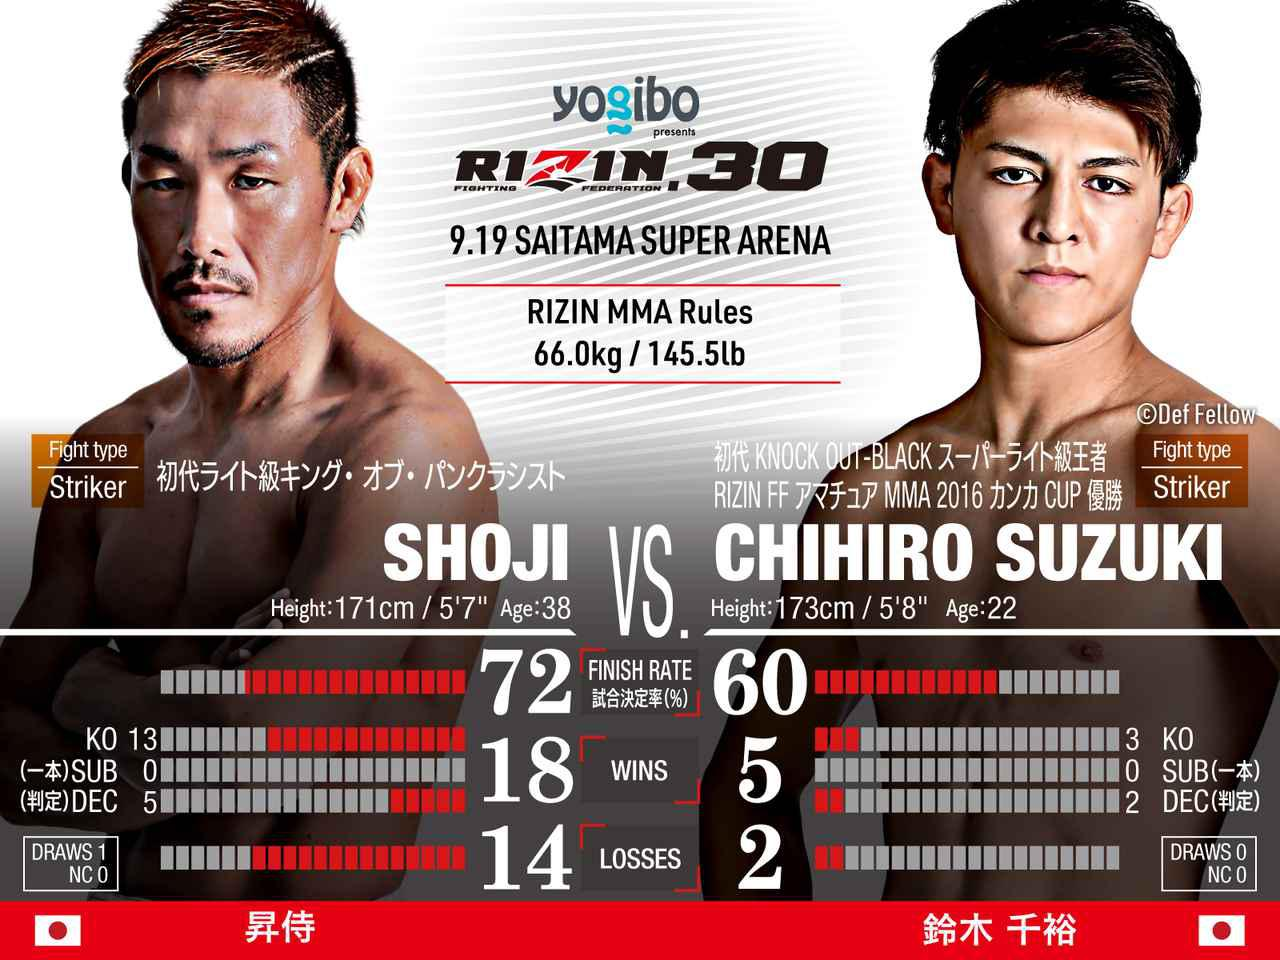 画像: Shoji vs Chihiro Suzuki